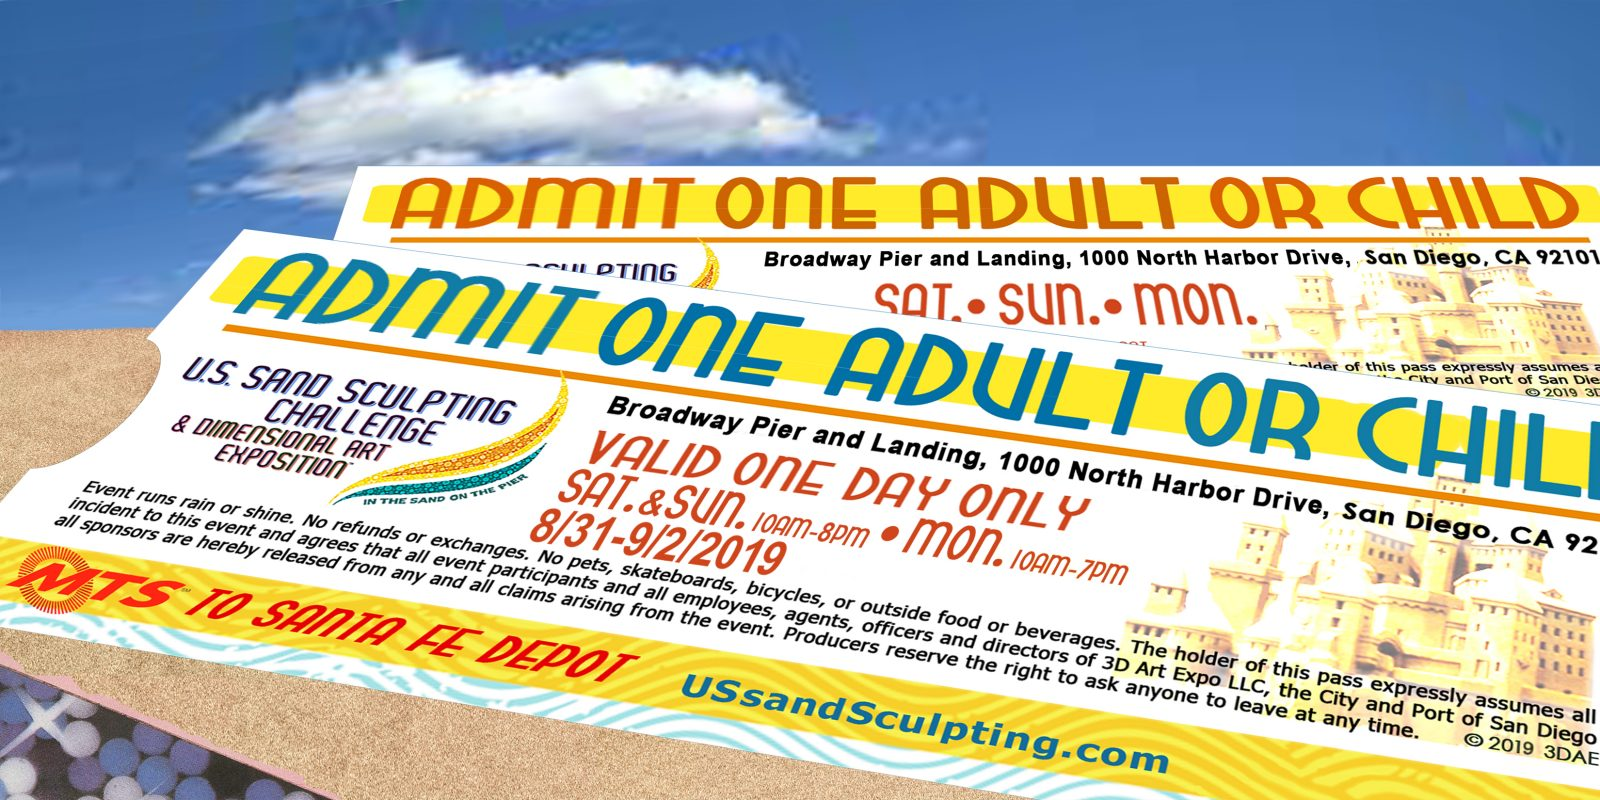 Buy tickets now online | US Sand Sculpting